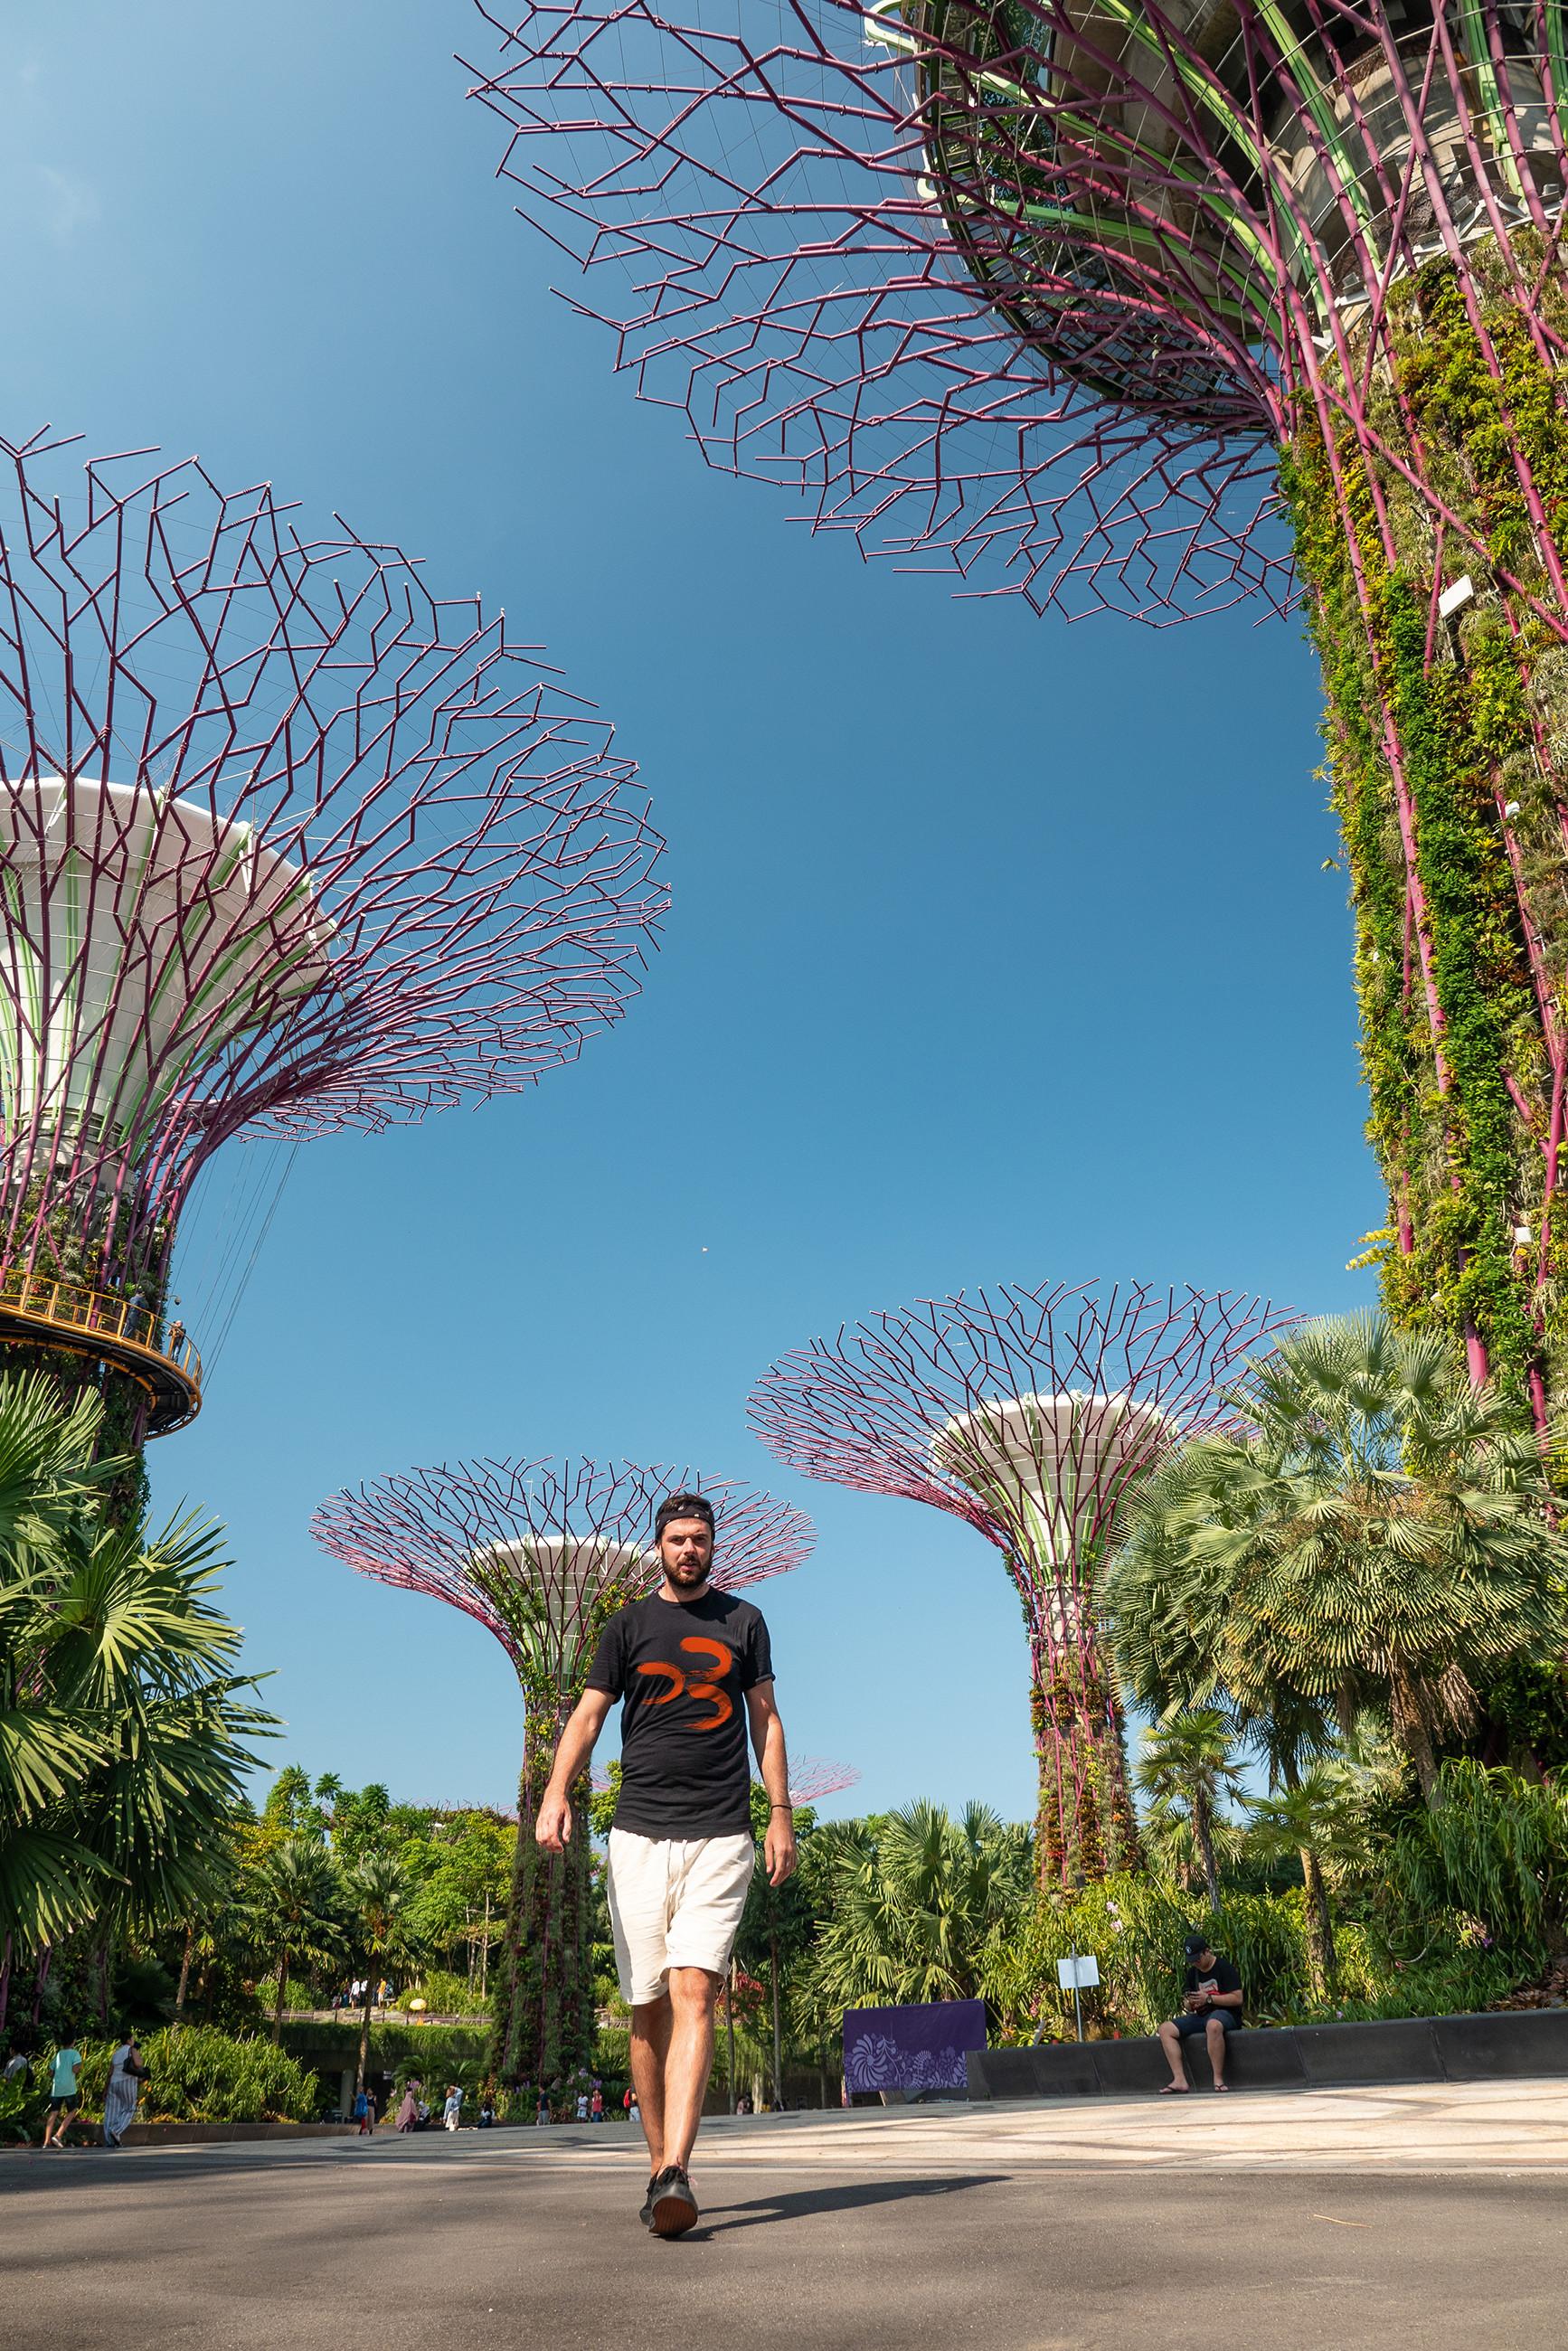 https://bubo.sk/uploads/galleries/5035/martinsimko_singapur_p1411826-1.jpg